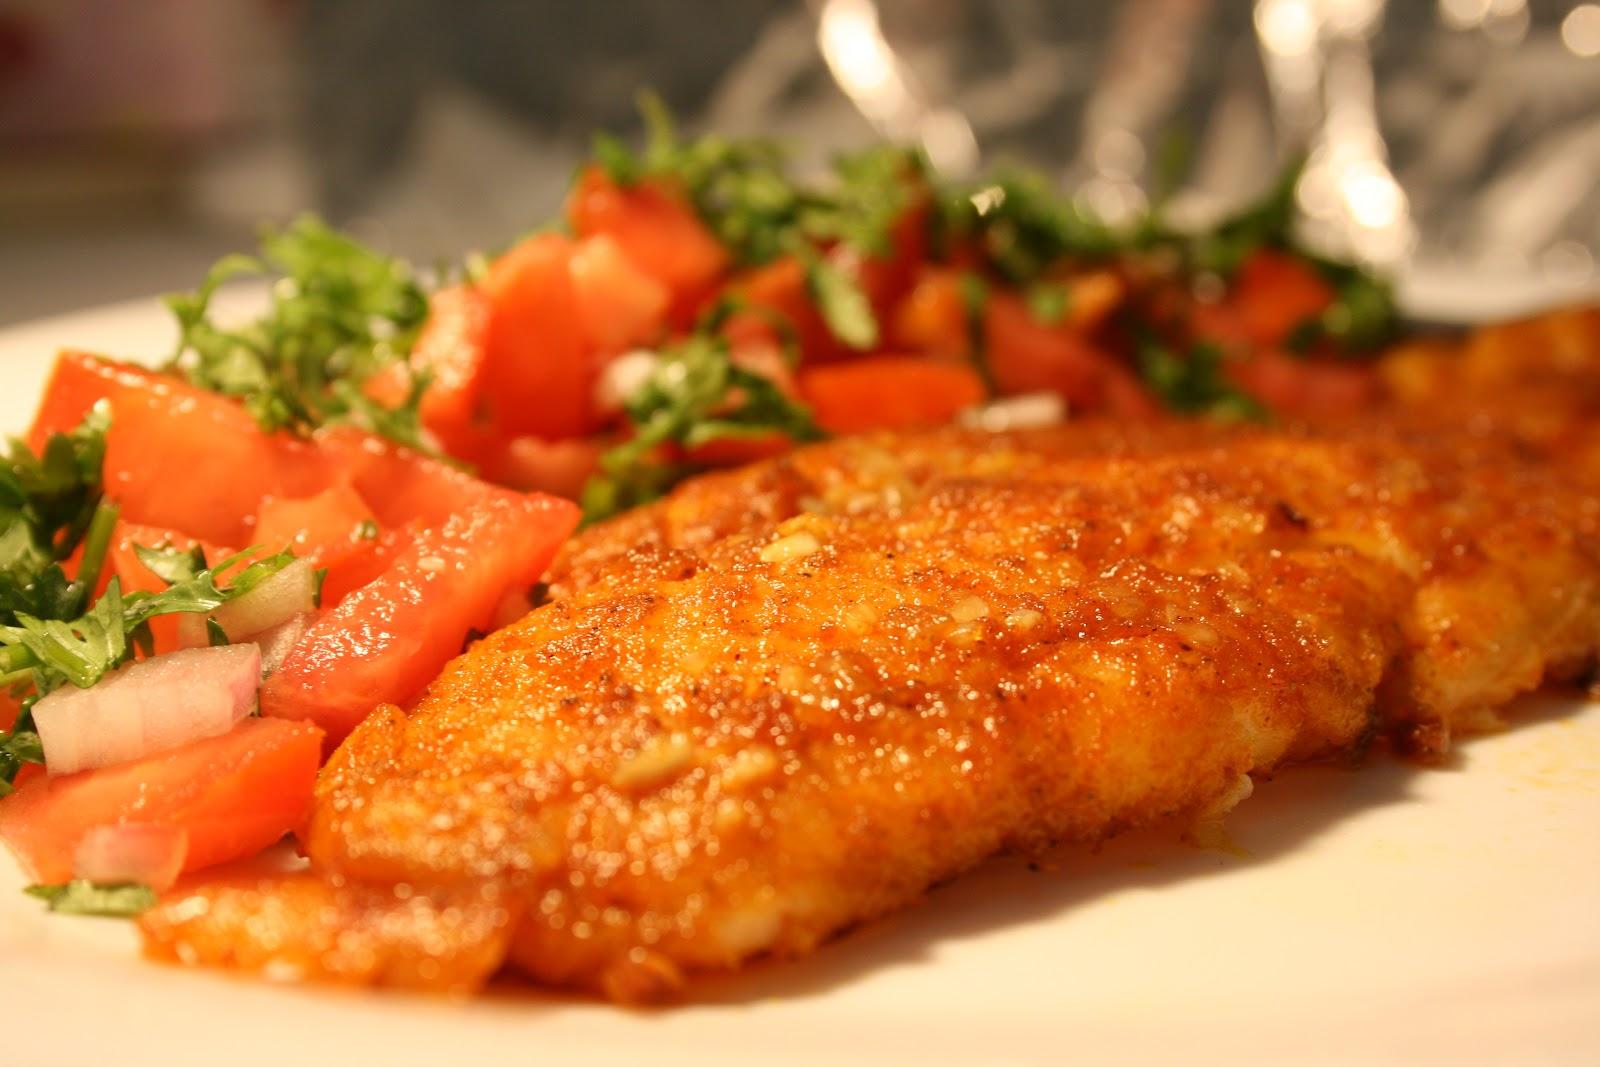 Fish fillet car interior design for Fish fillet recipe